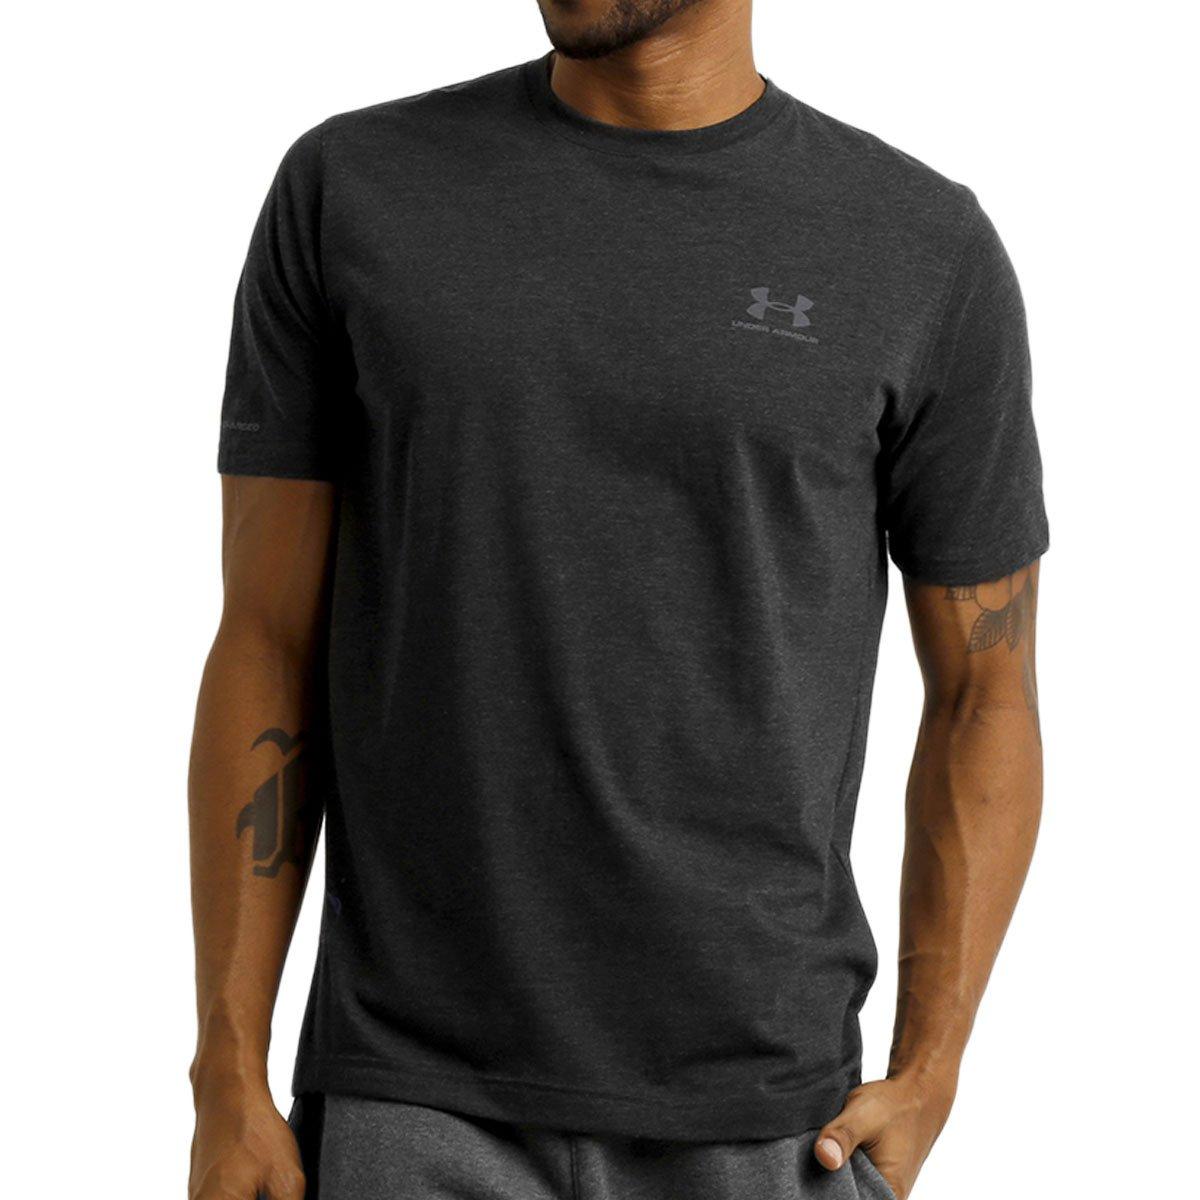 73bee9431b4 Camiseta Under Armour Left Chest Lockup